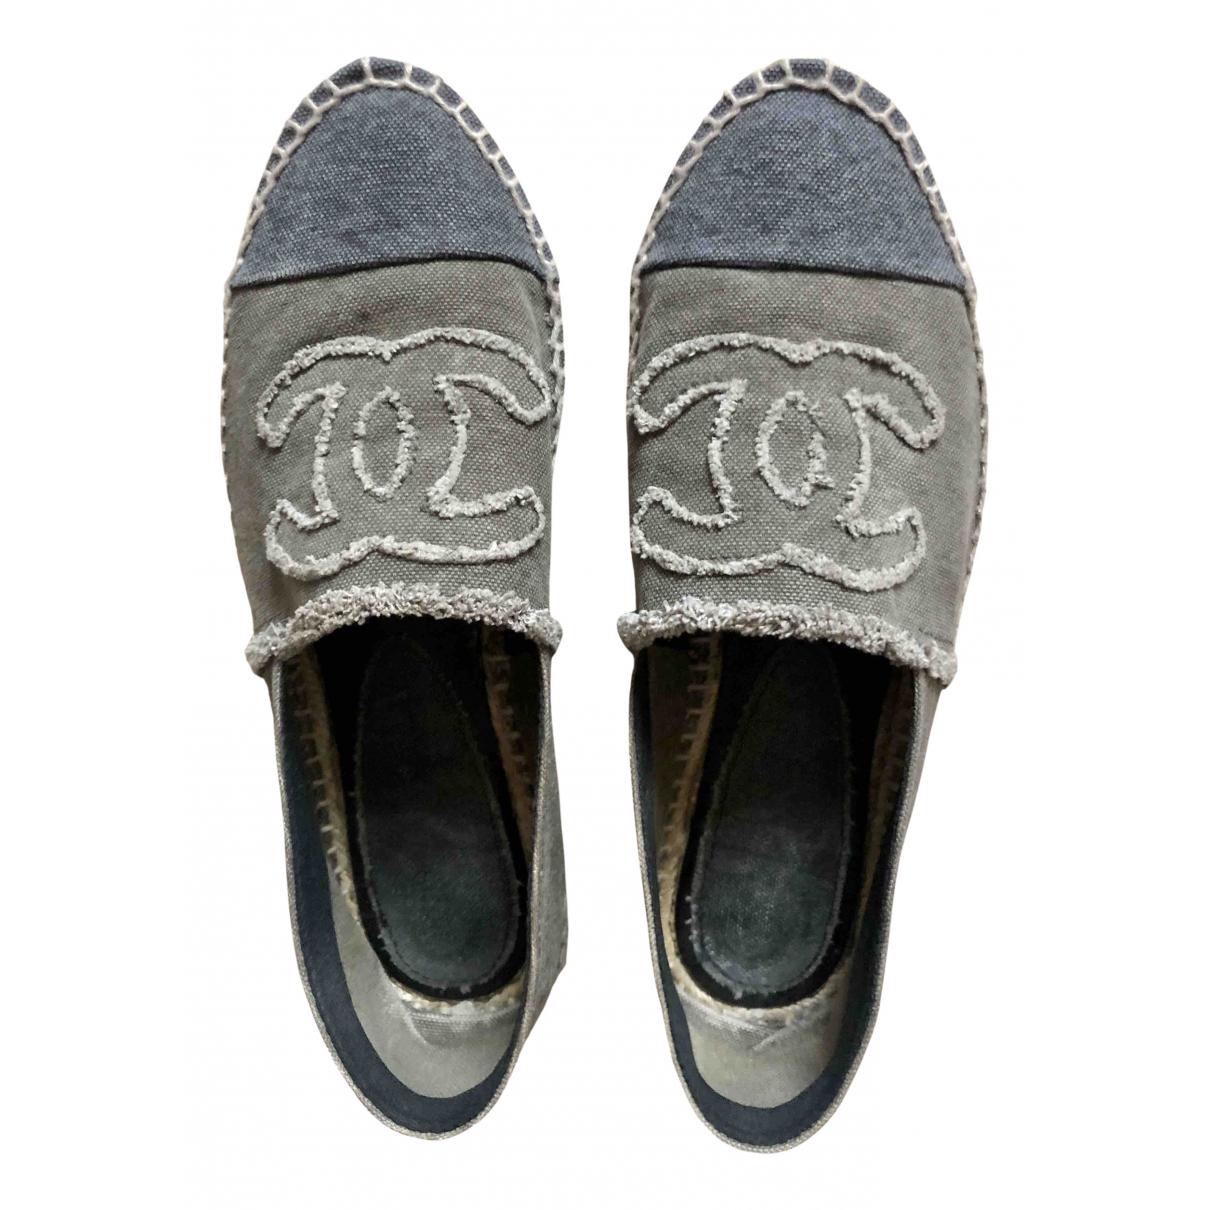 Chanel \N Espadrilles in  Grau Leinen